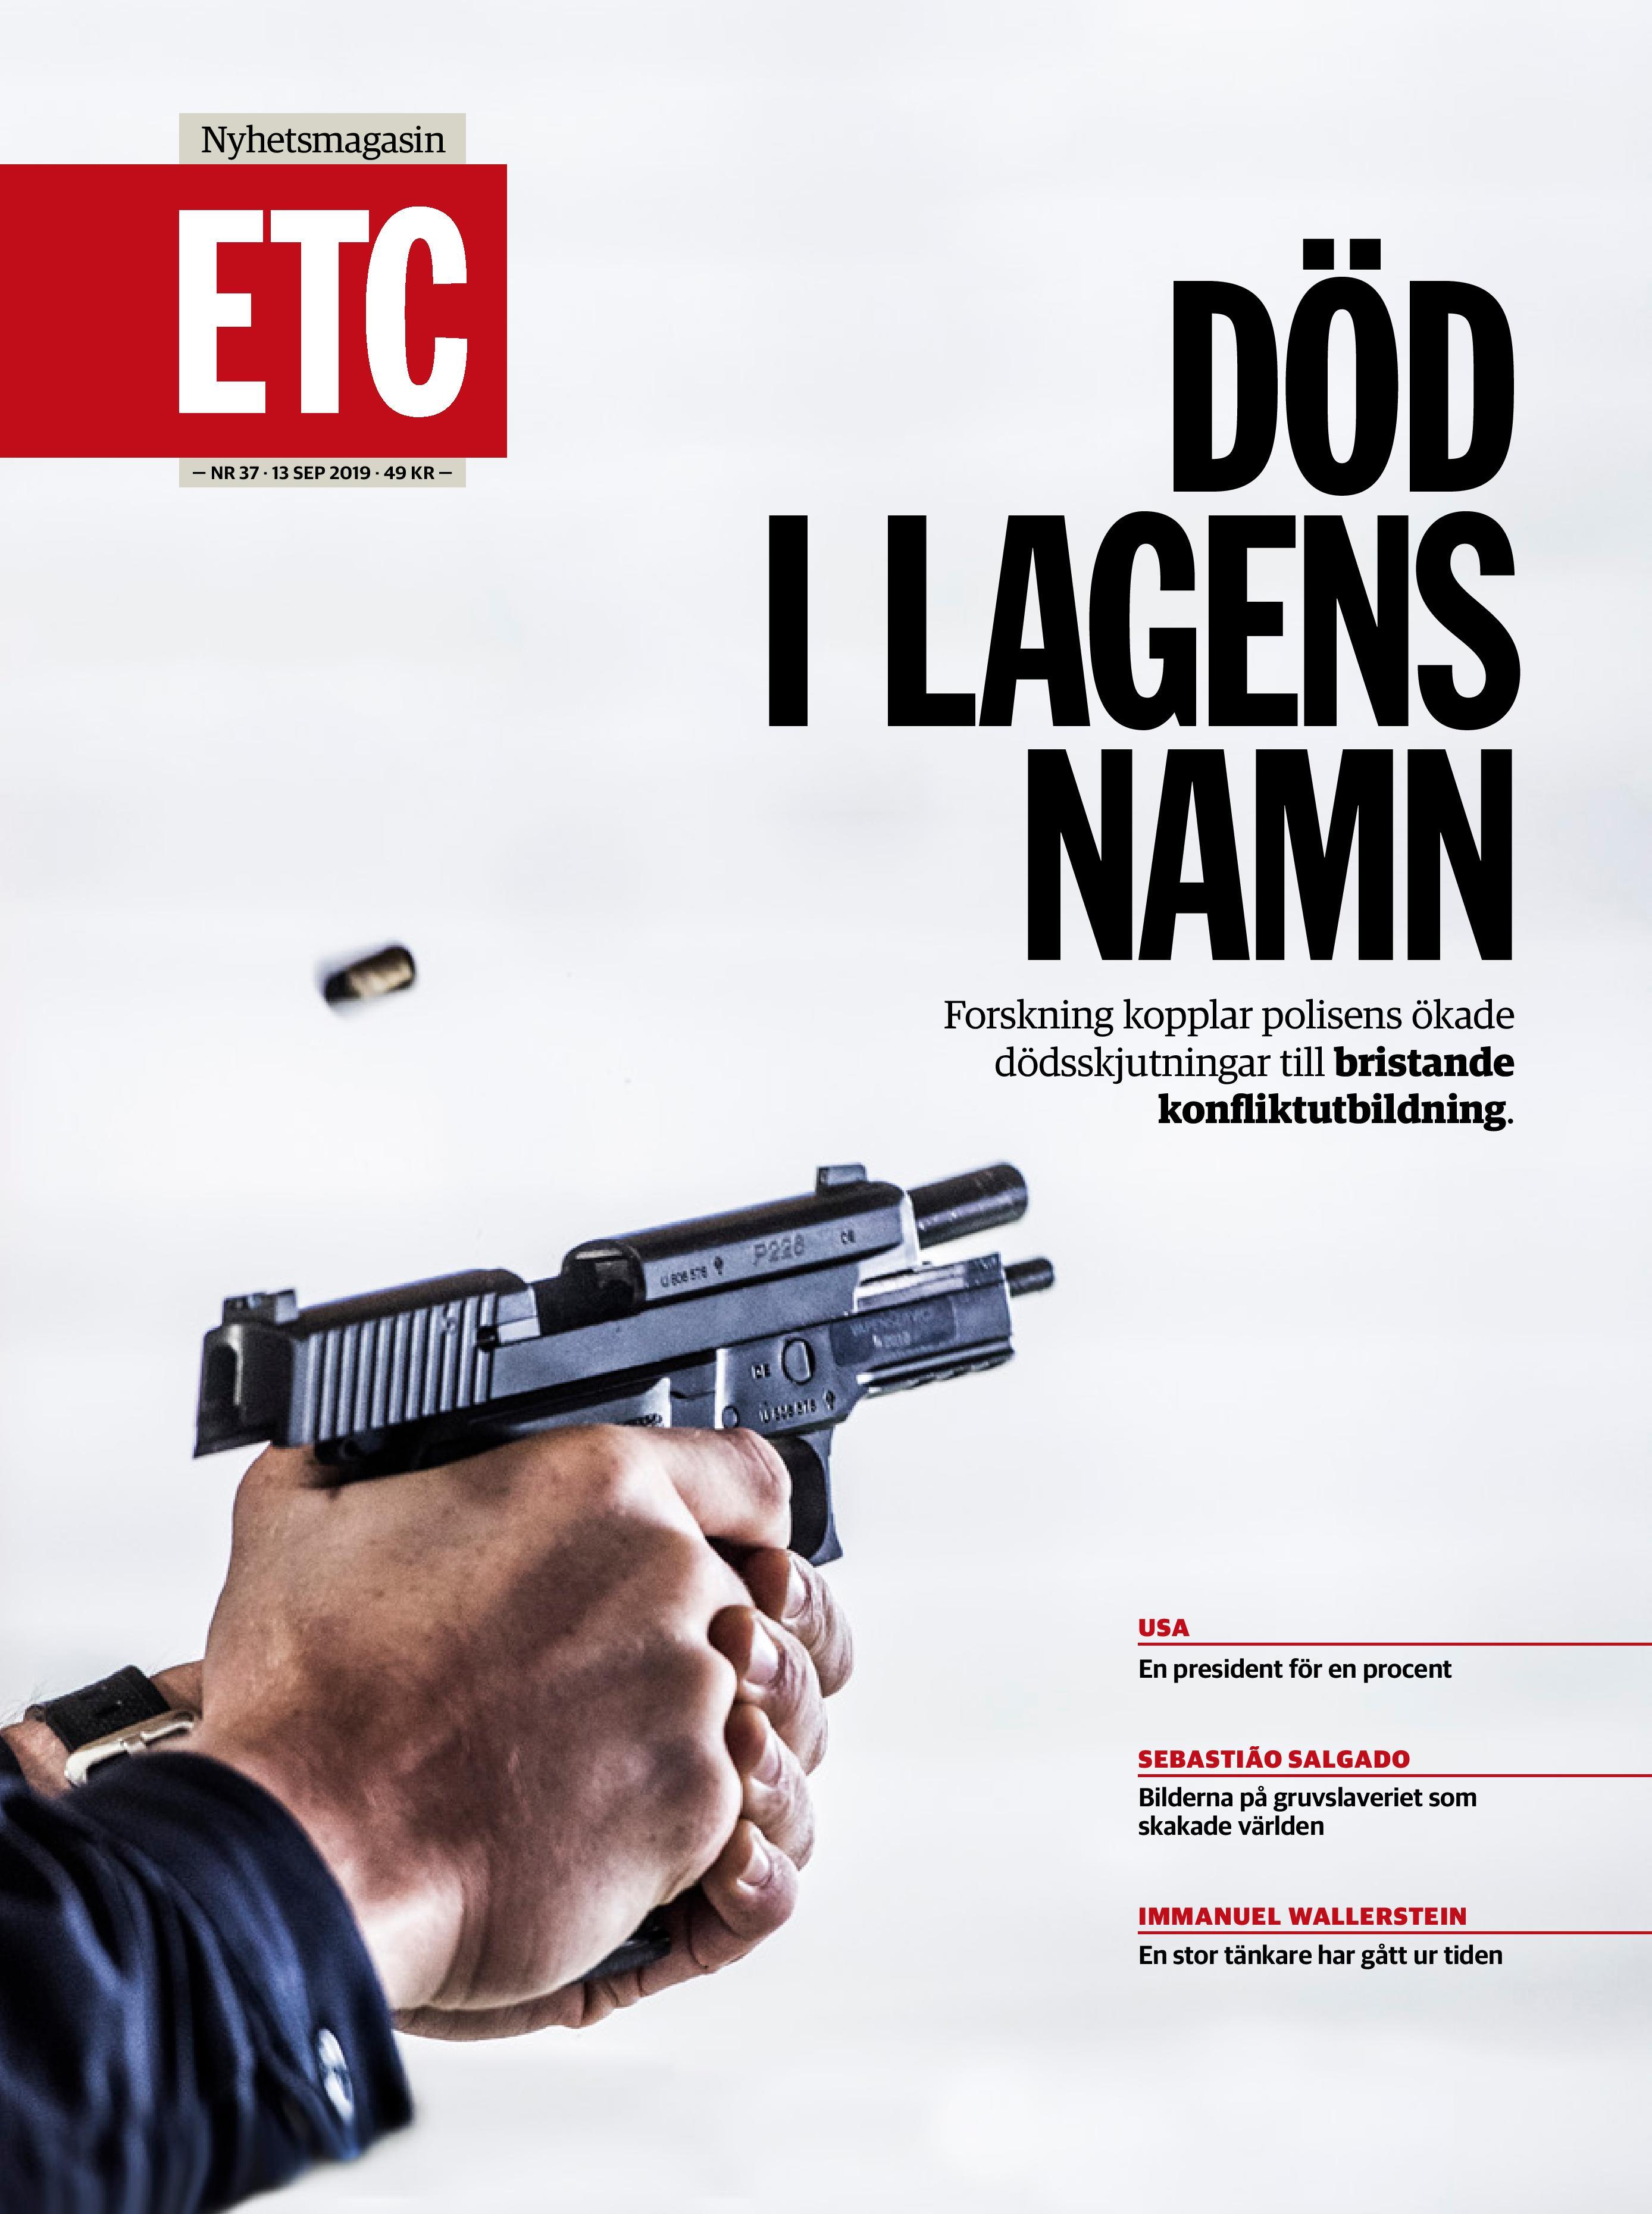 Polisens dödsskjutningar, Nyhetsmagasinet ETC 2019-09-13